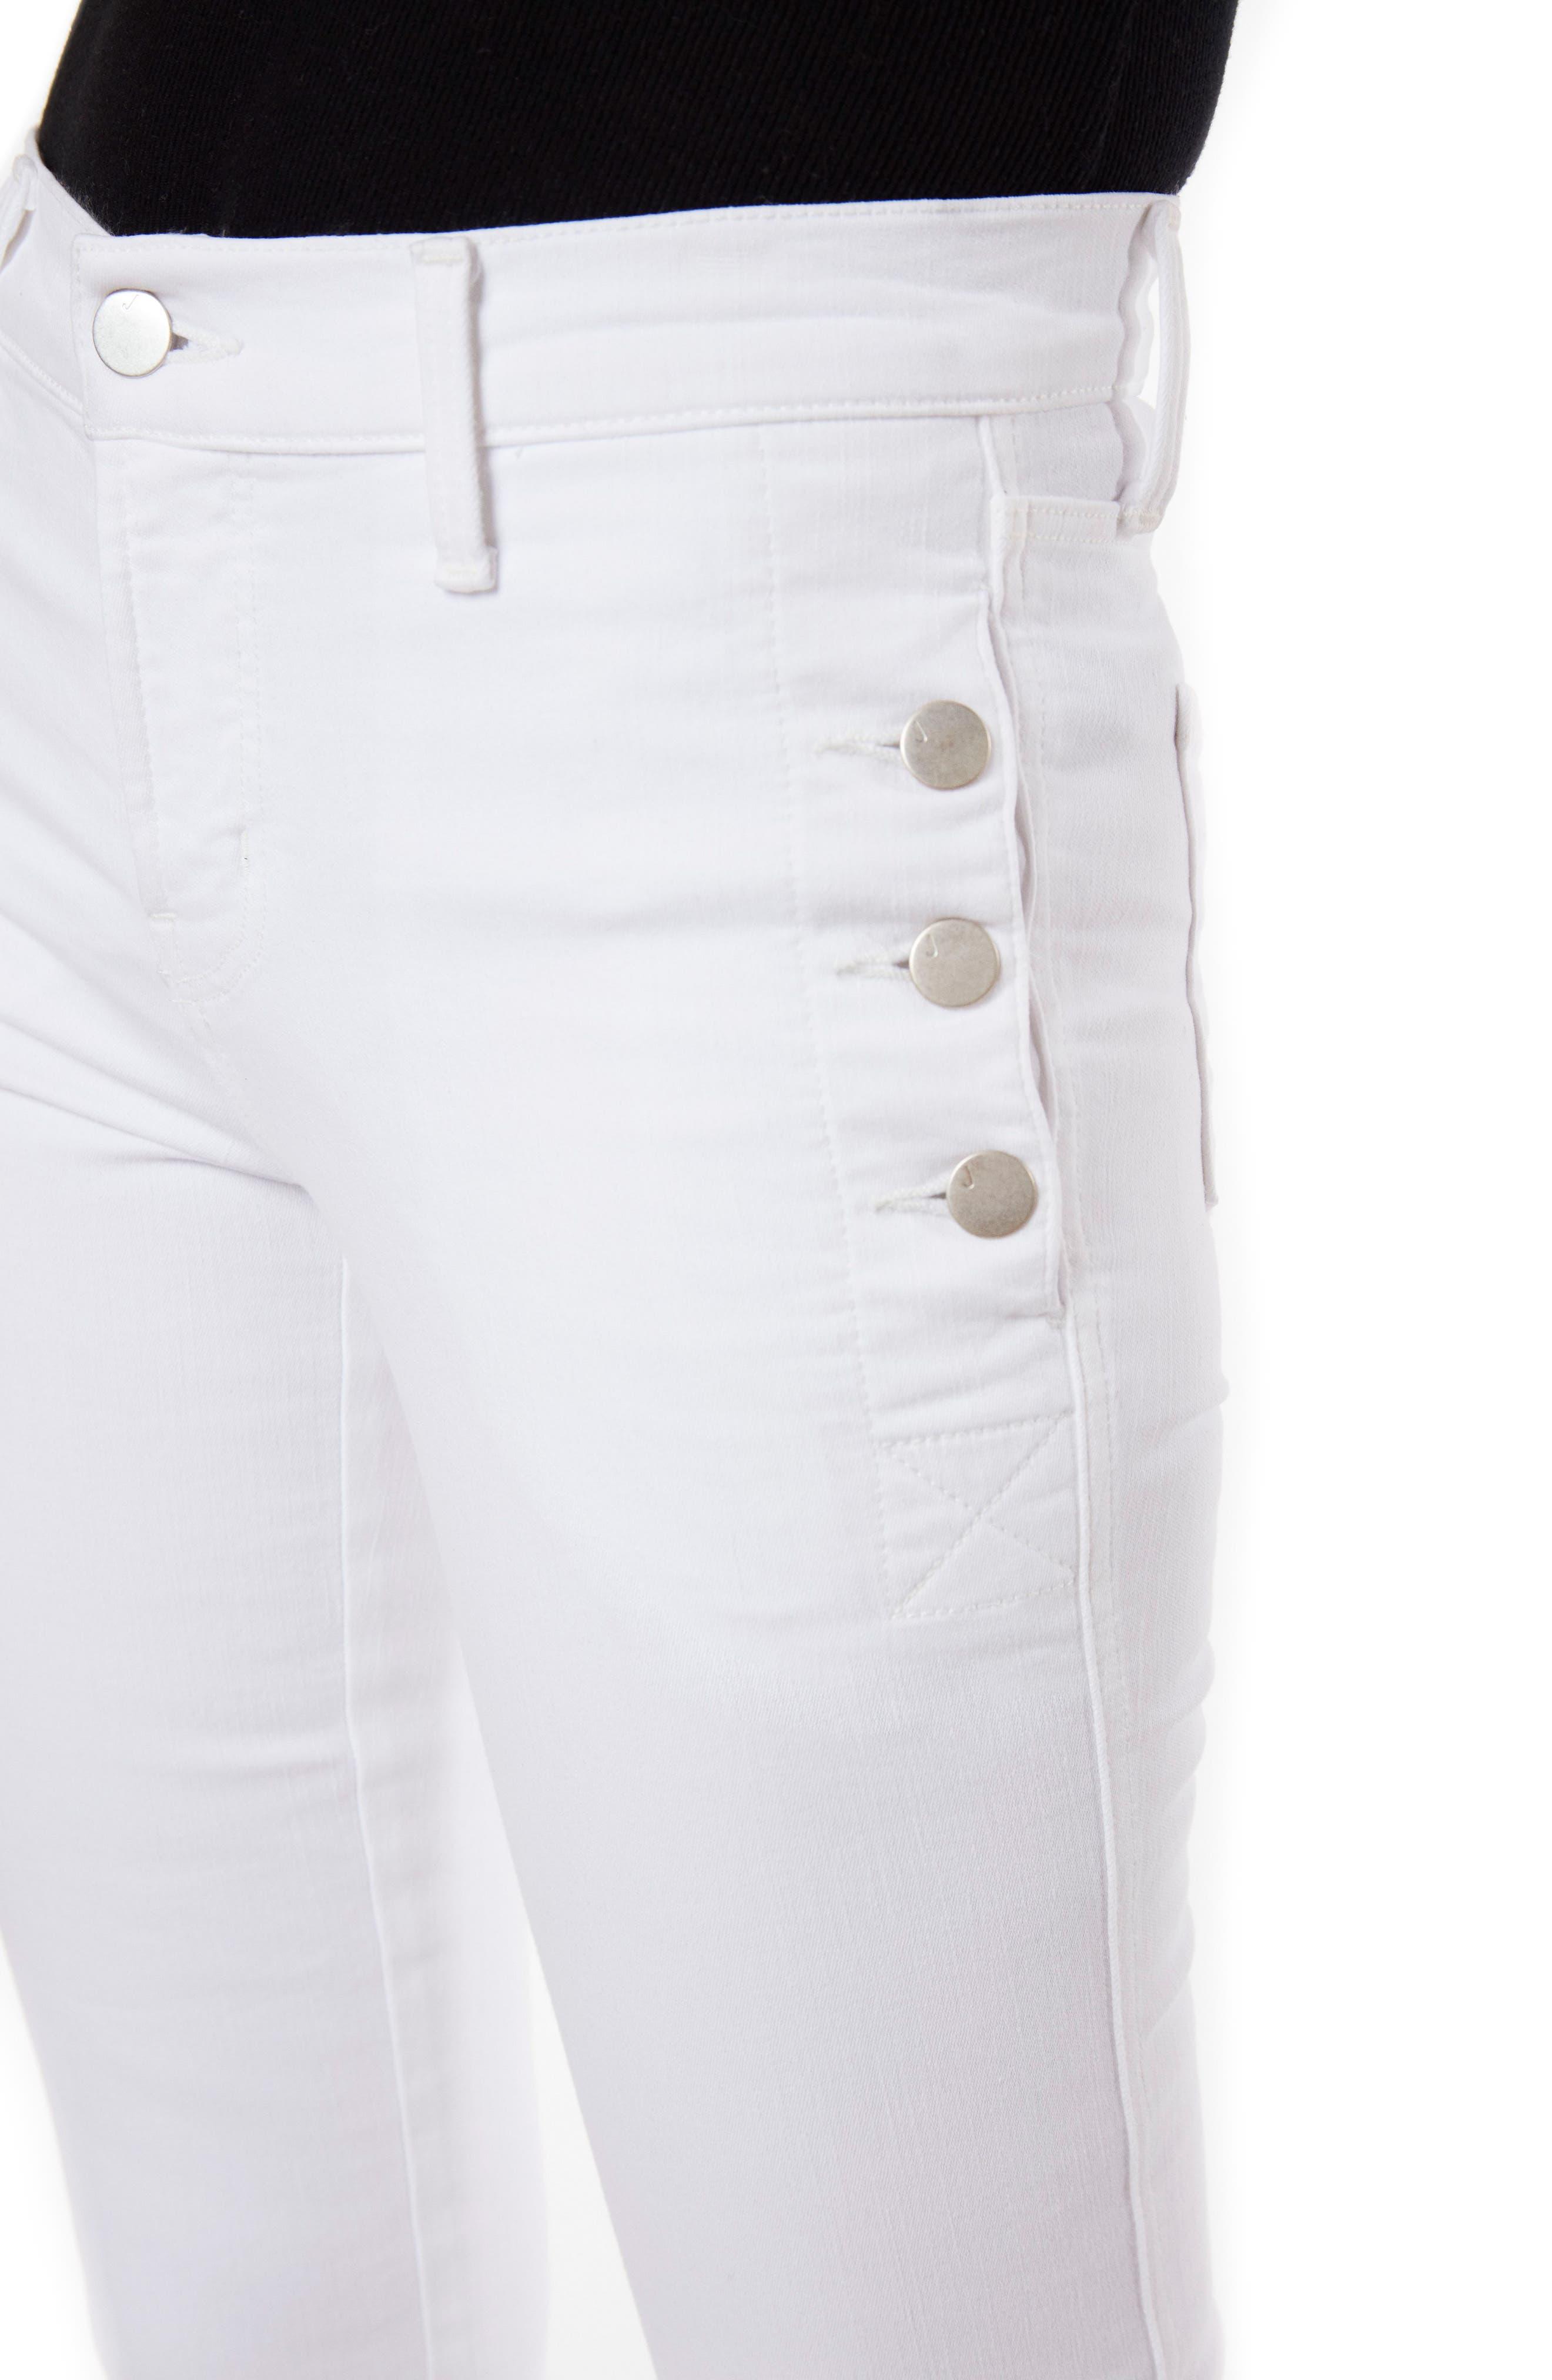 Zion Crop Flare Jeans,                             Alternate thumbnail 4, color,                             Blanc